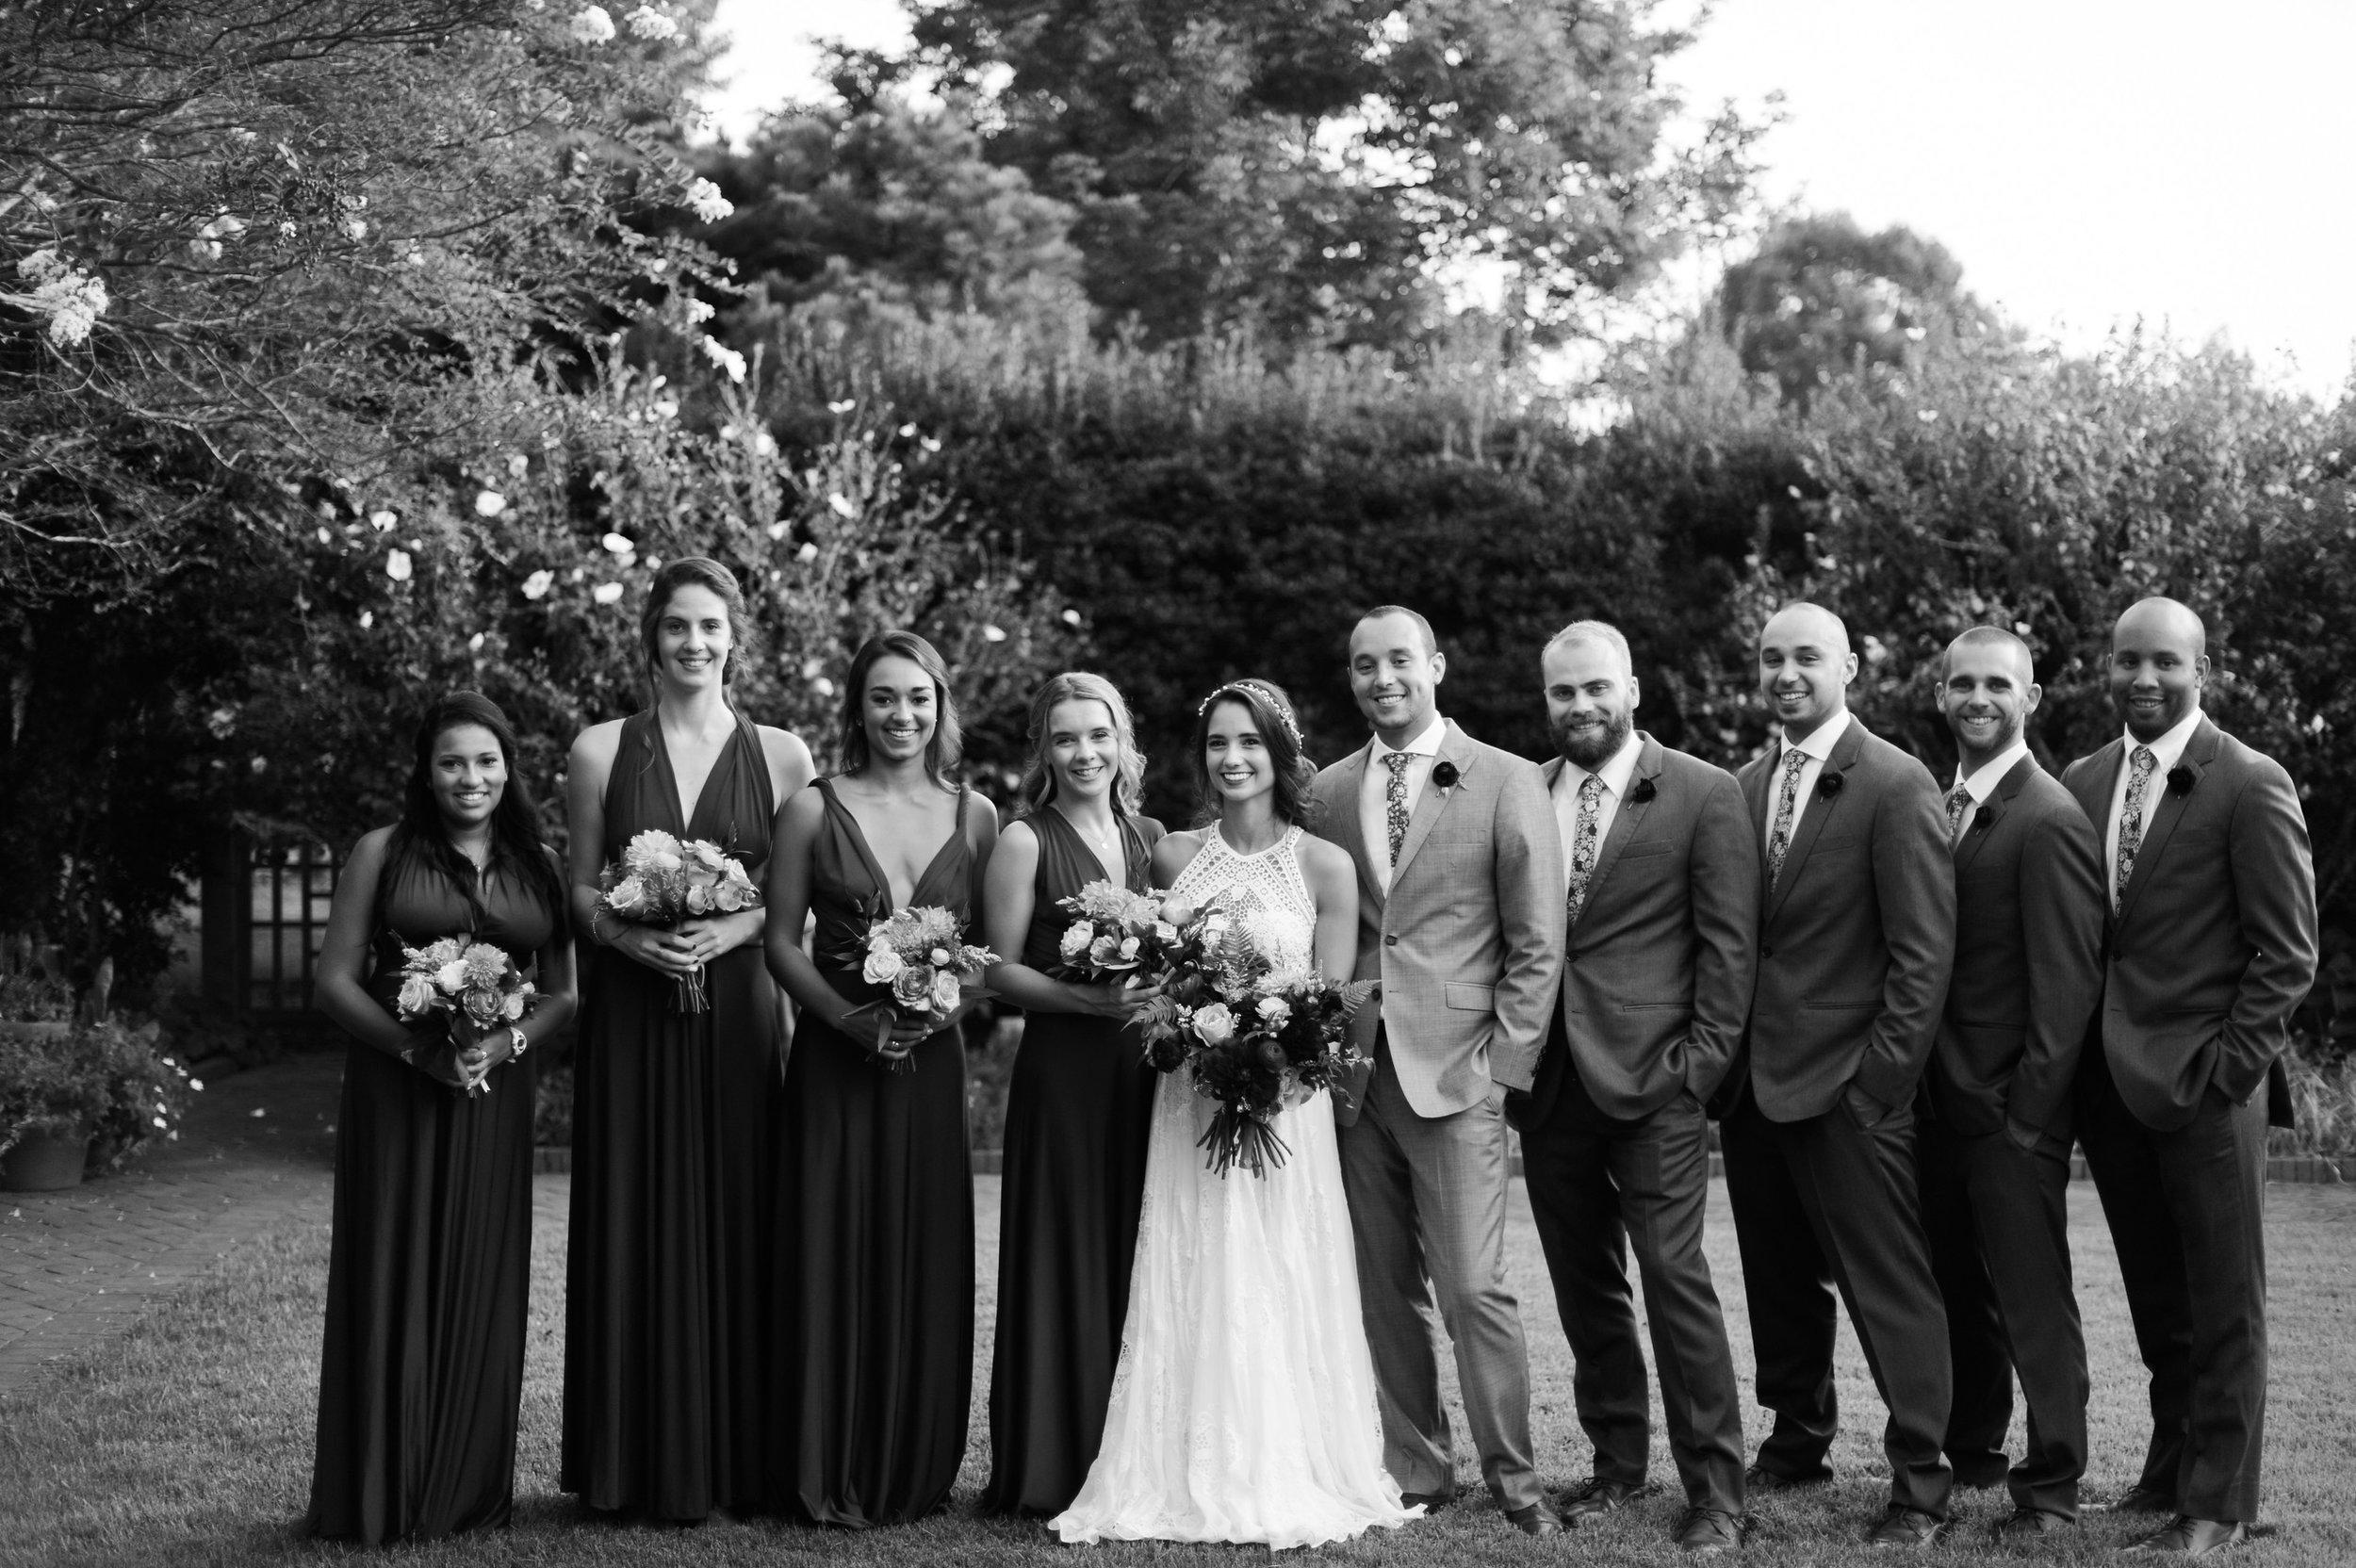 thomas-wedding-313-X5.jpg